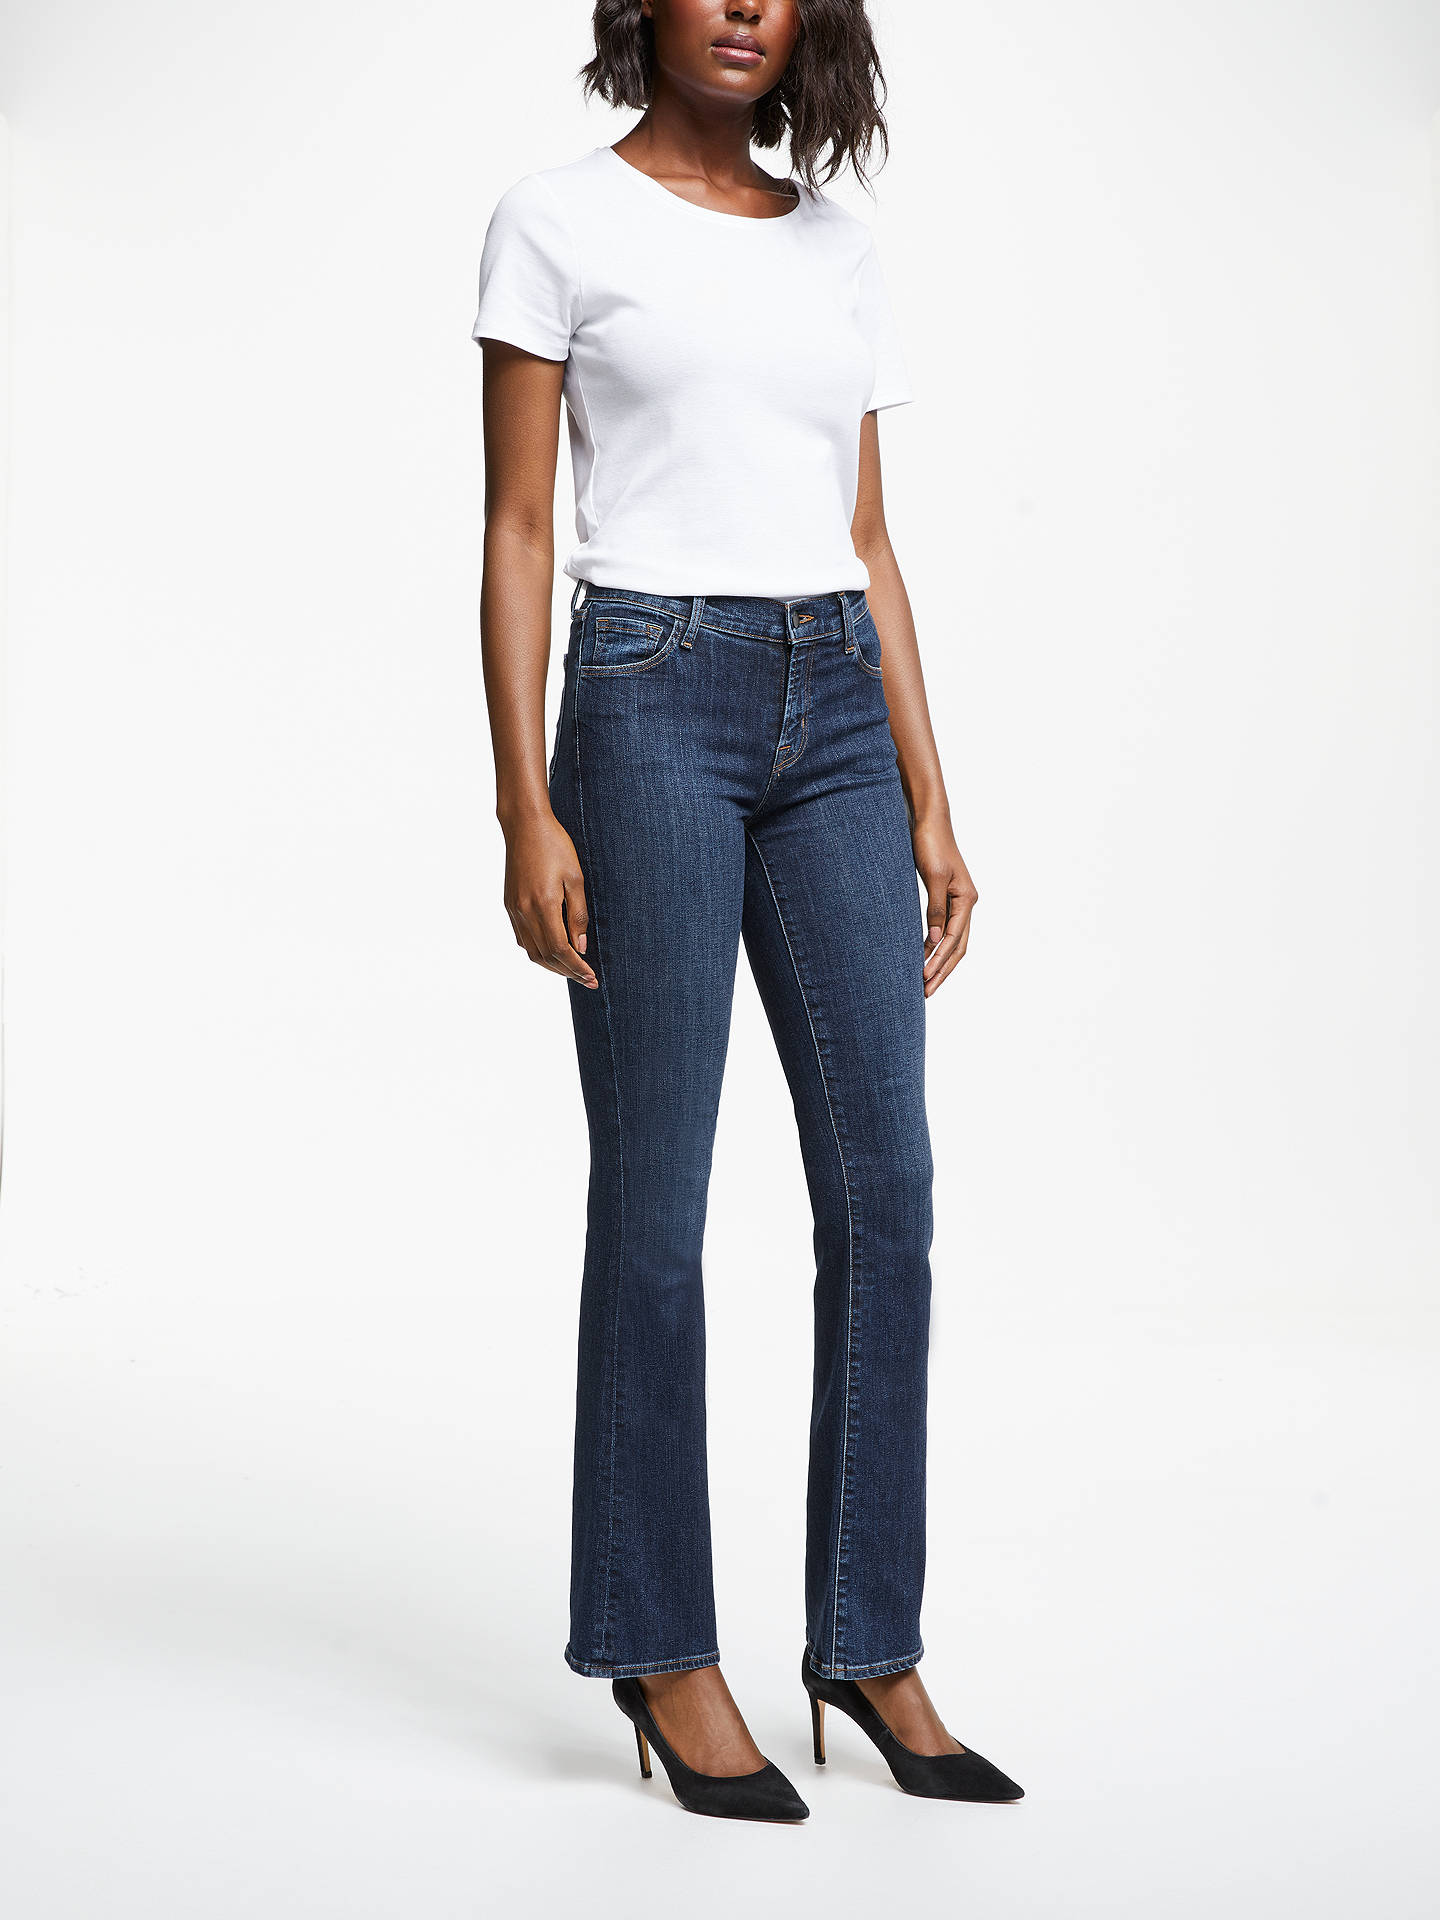 J Brand Jeans Womens Sallie Mid Rise Boot Cut